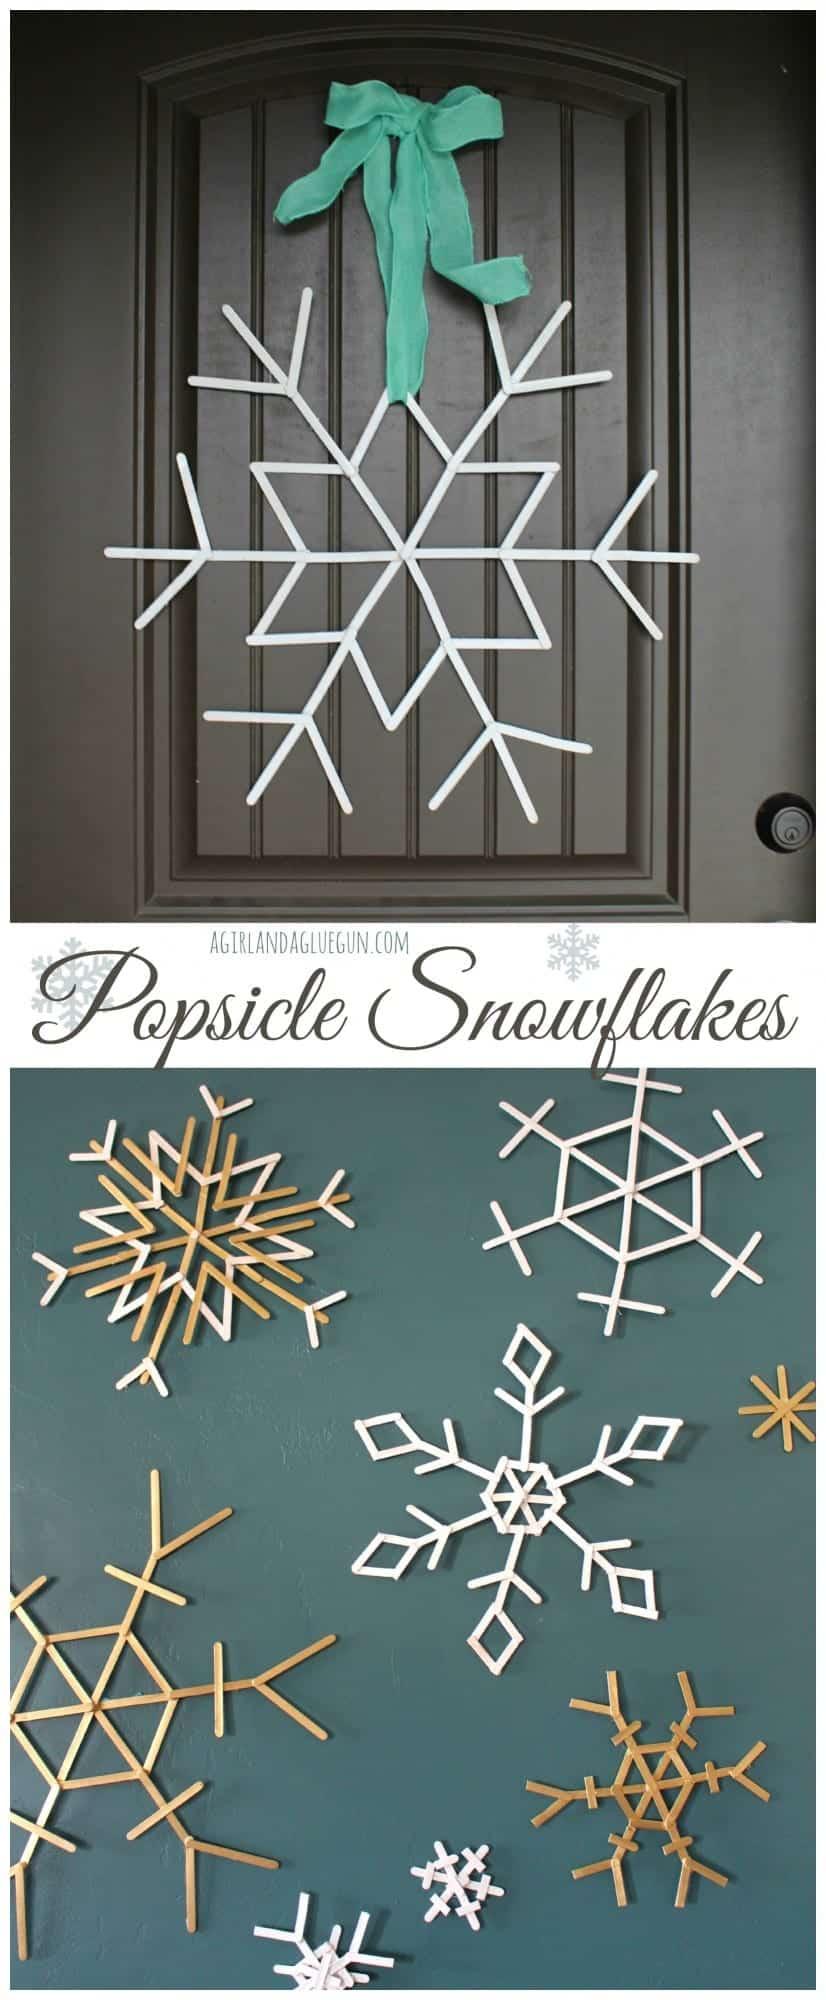 Popsicle snowflakes